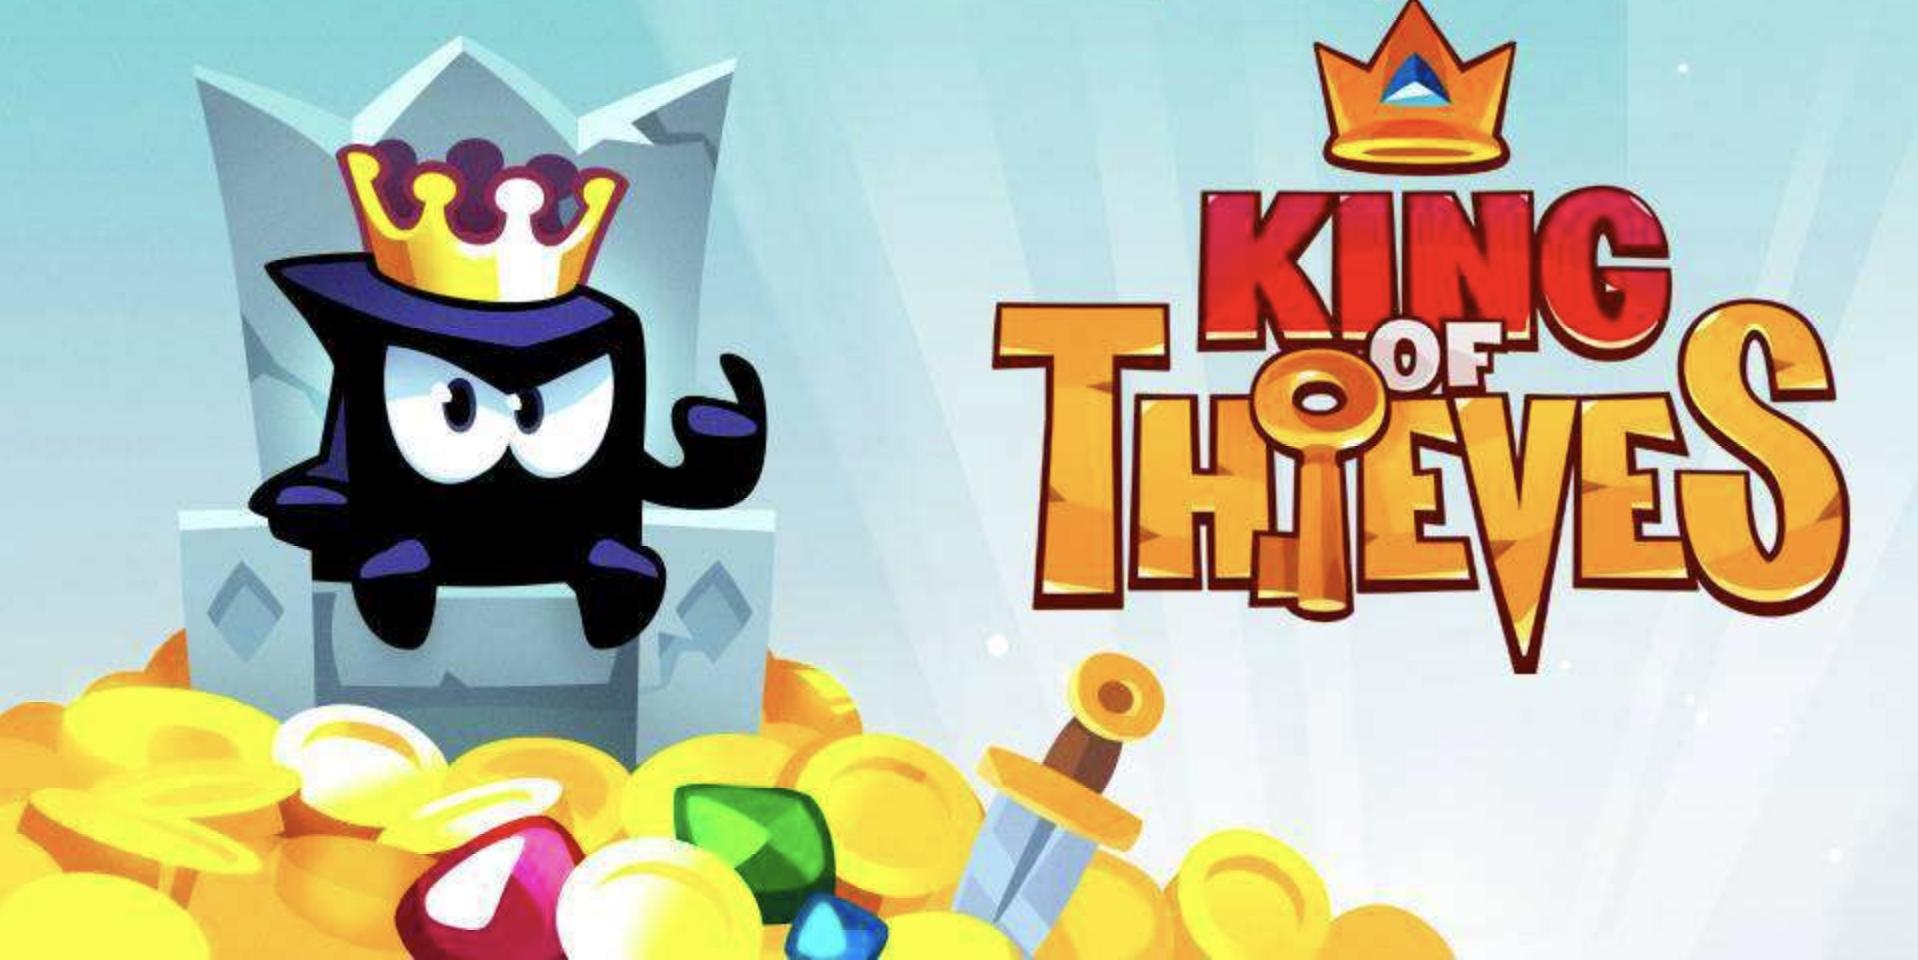 От идеи до 10 миллионов скачиваний: King of Thieves (Олег Якубенков, Zeptolab)